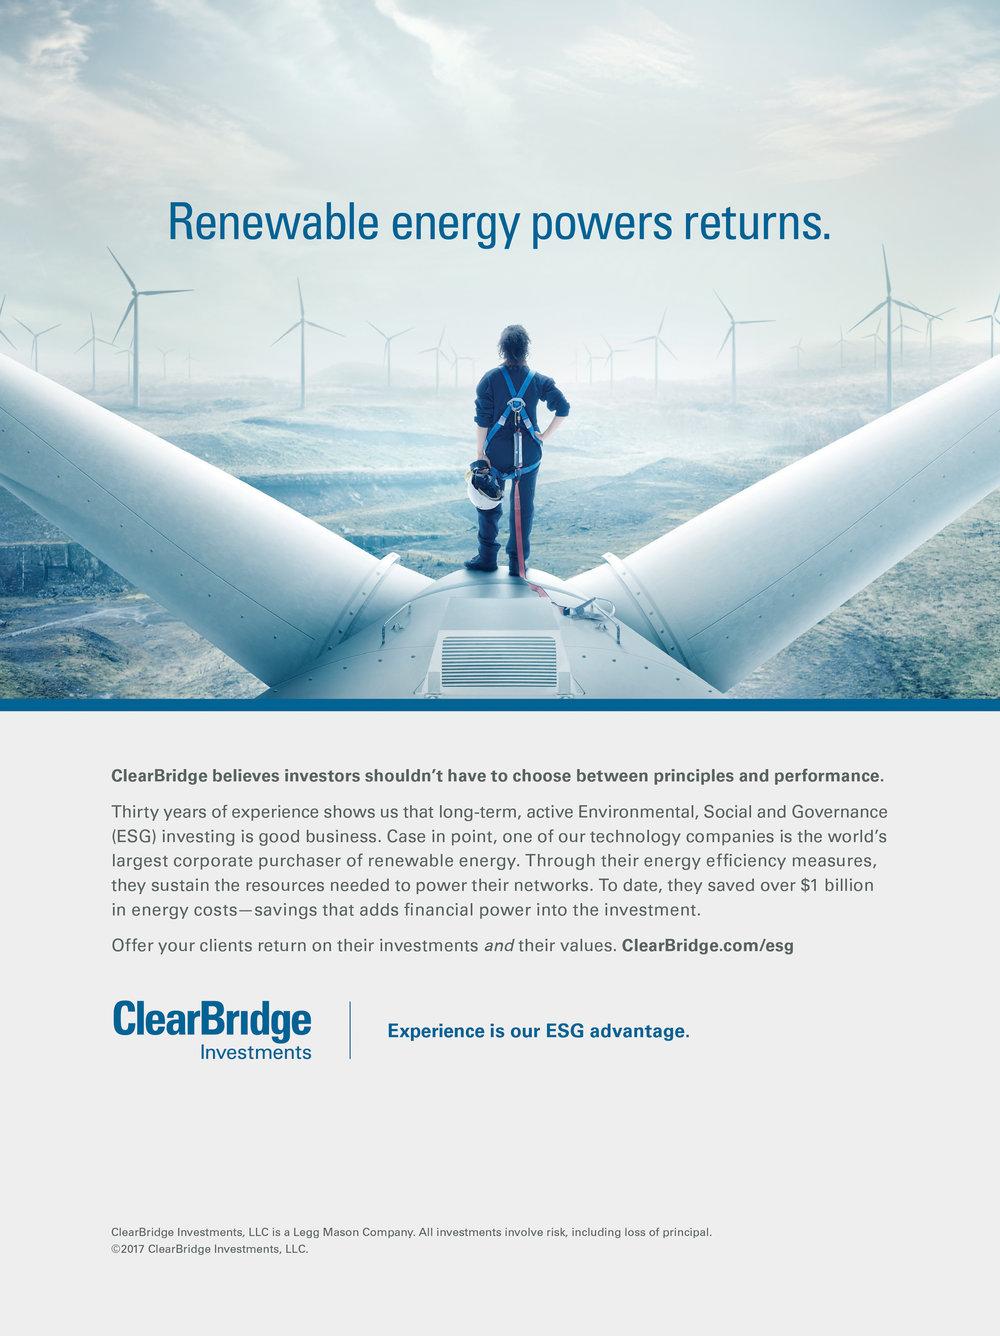 clearbridge_investments_ESG_mysisterfred_advertising_campaign_2017_renewable_energy.jpg